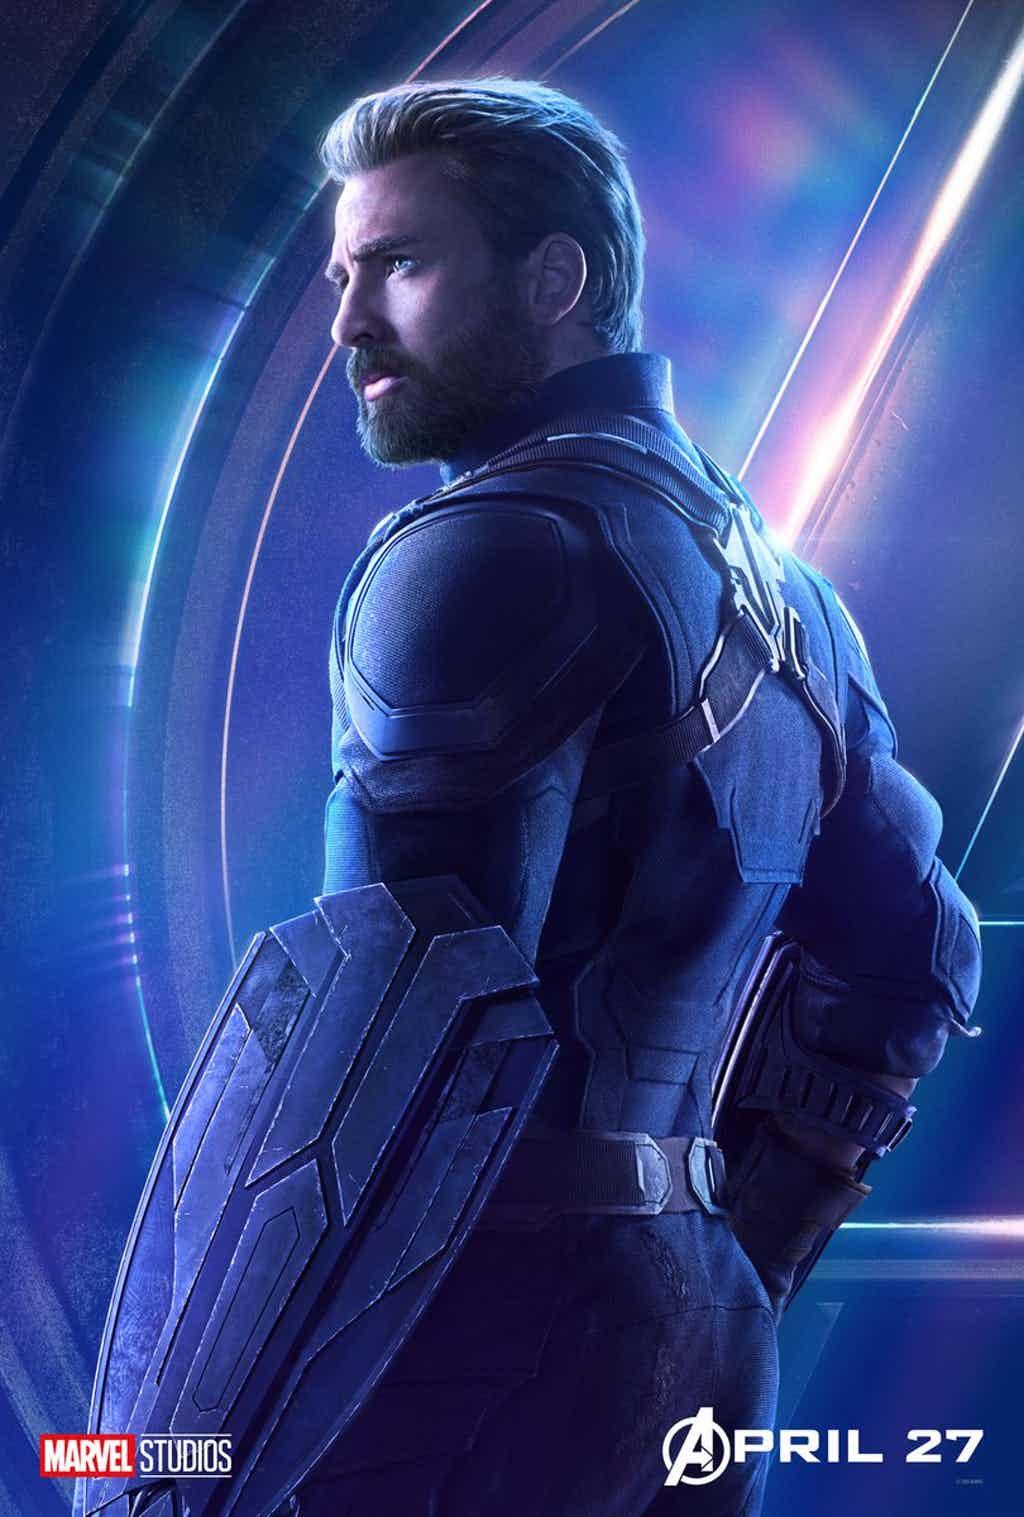 szmk_marvel_infinity_war_vegtelen_haboru_bosszuallok_avengers_ironman_hulk_thor_captainamaerica_guardians_galaxy_2.jpg